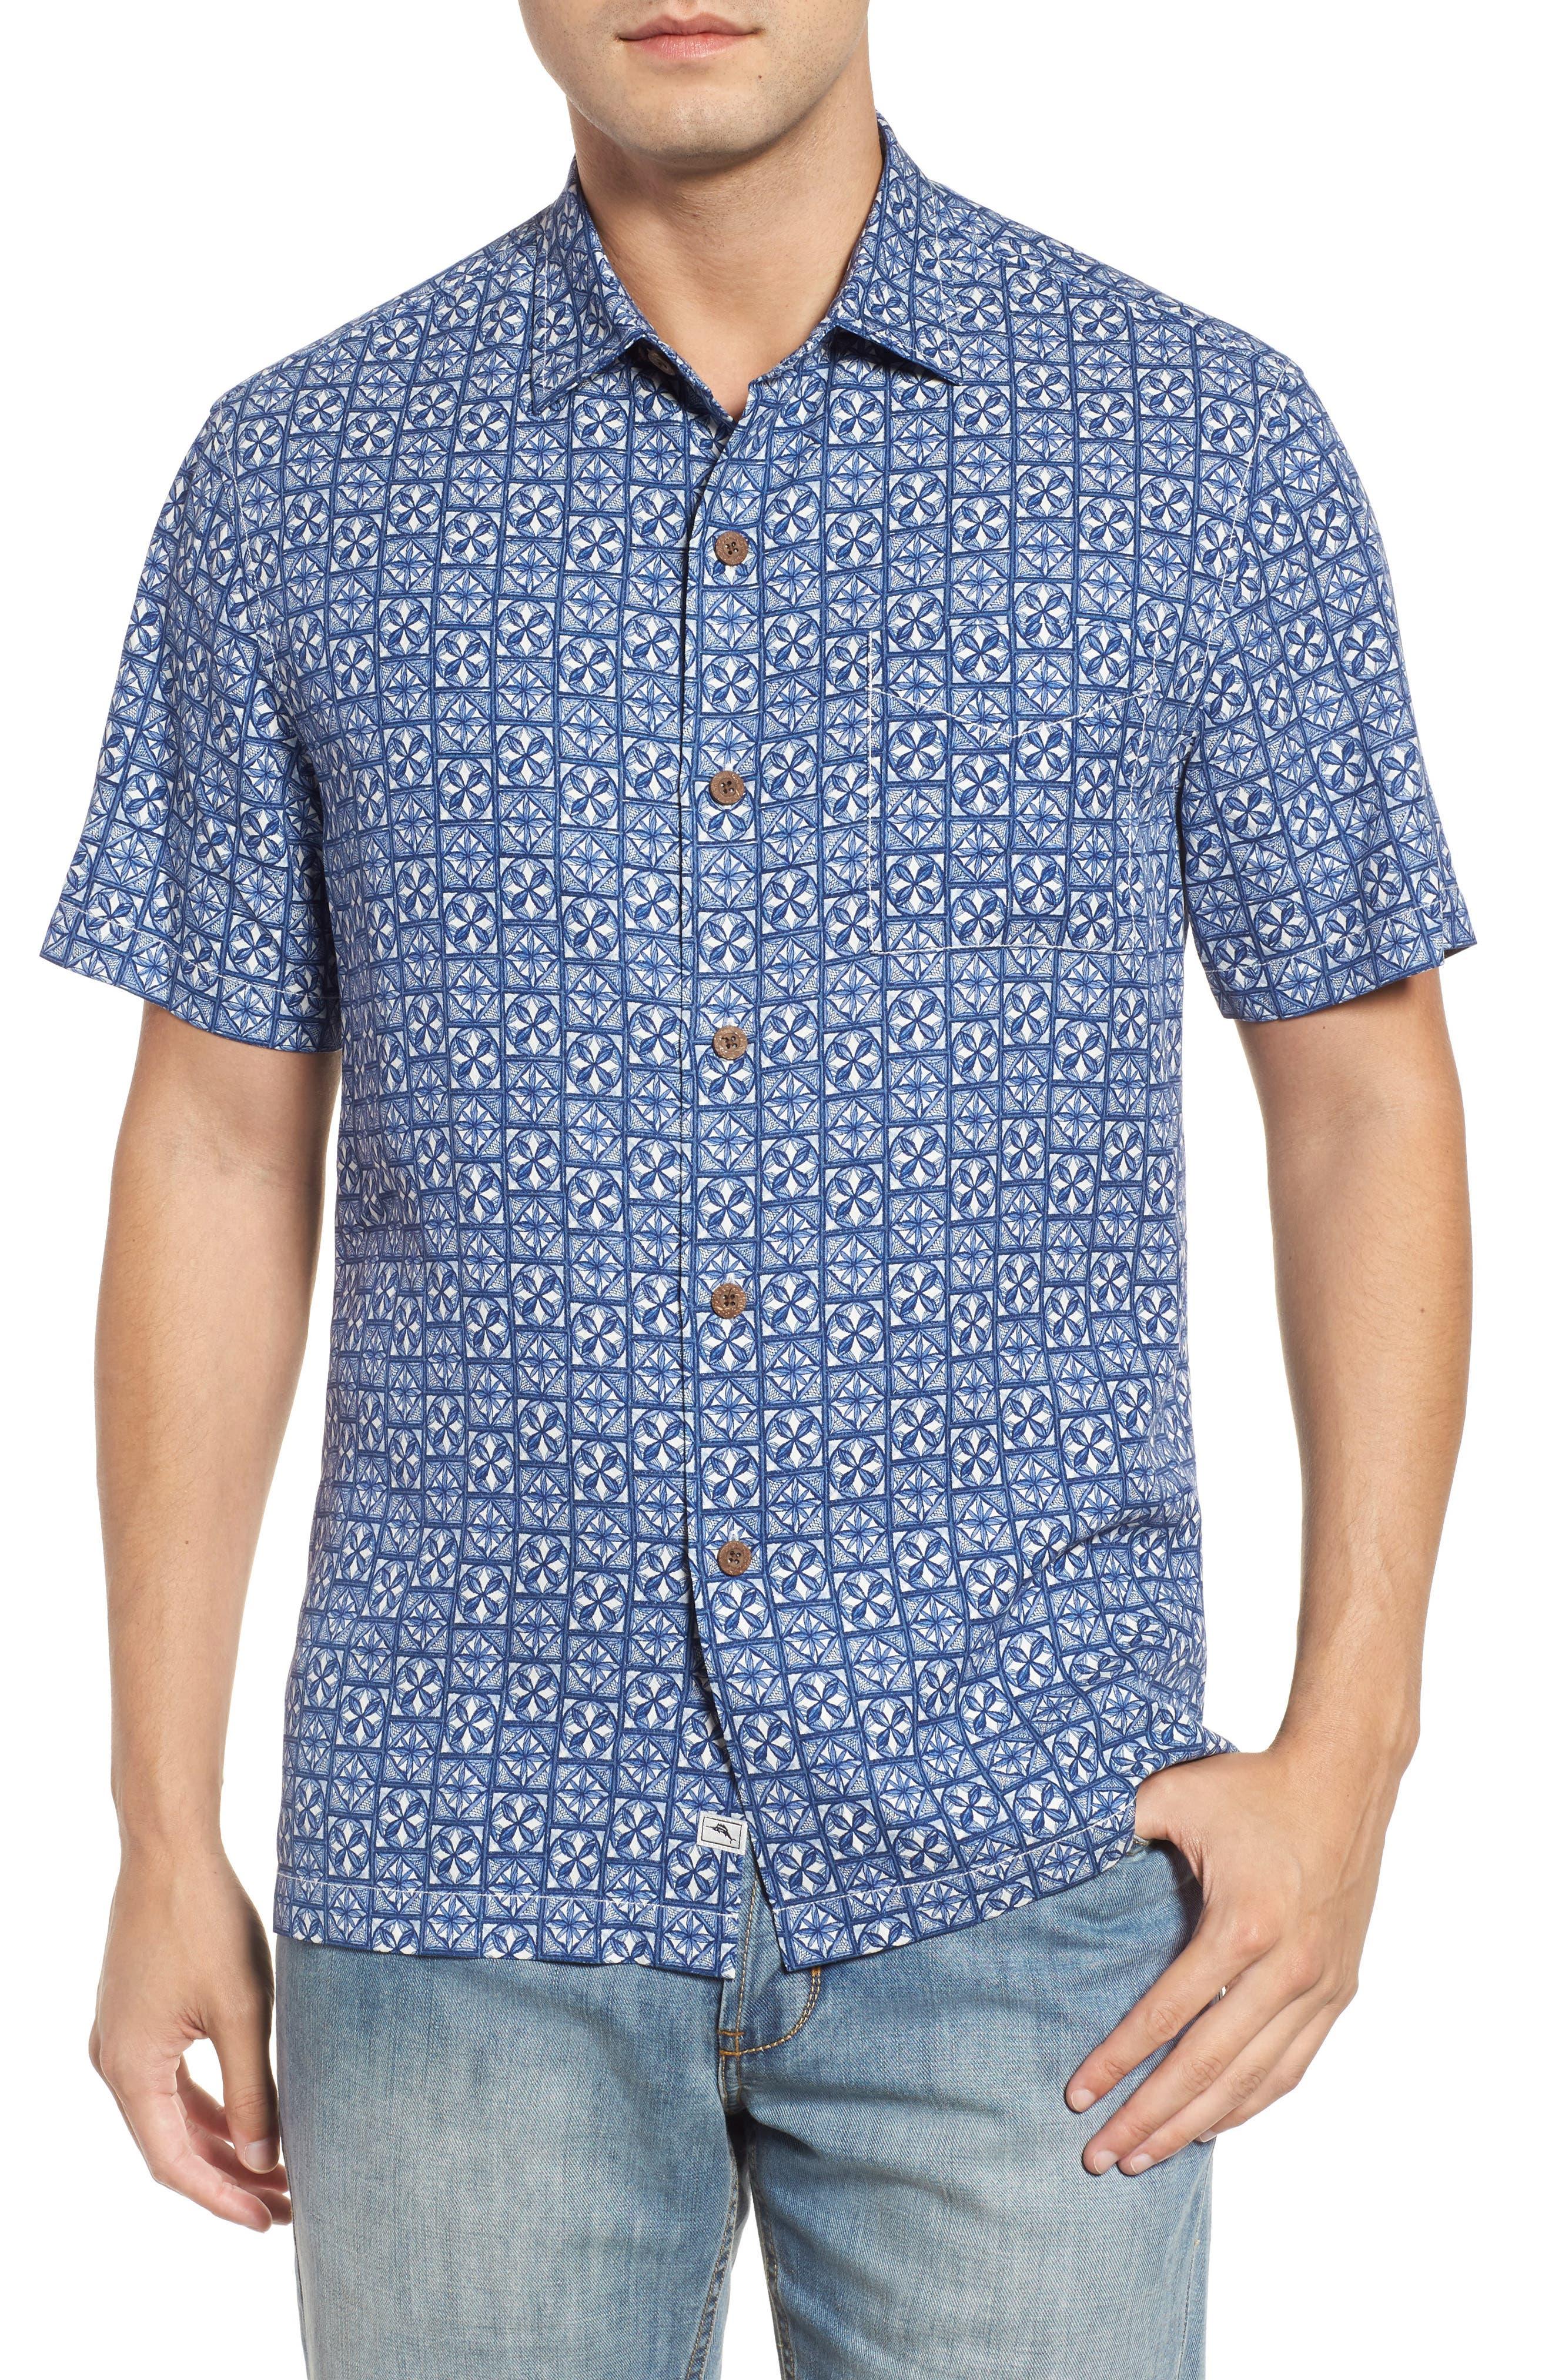 Alternate Image 1 Selected - Tommy Bahama Juno Beach Geo Print Silk Camp Shirt